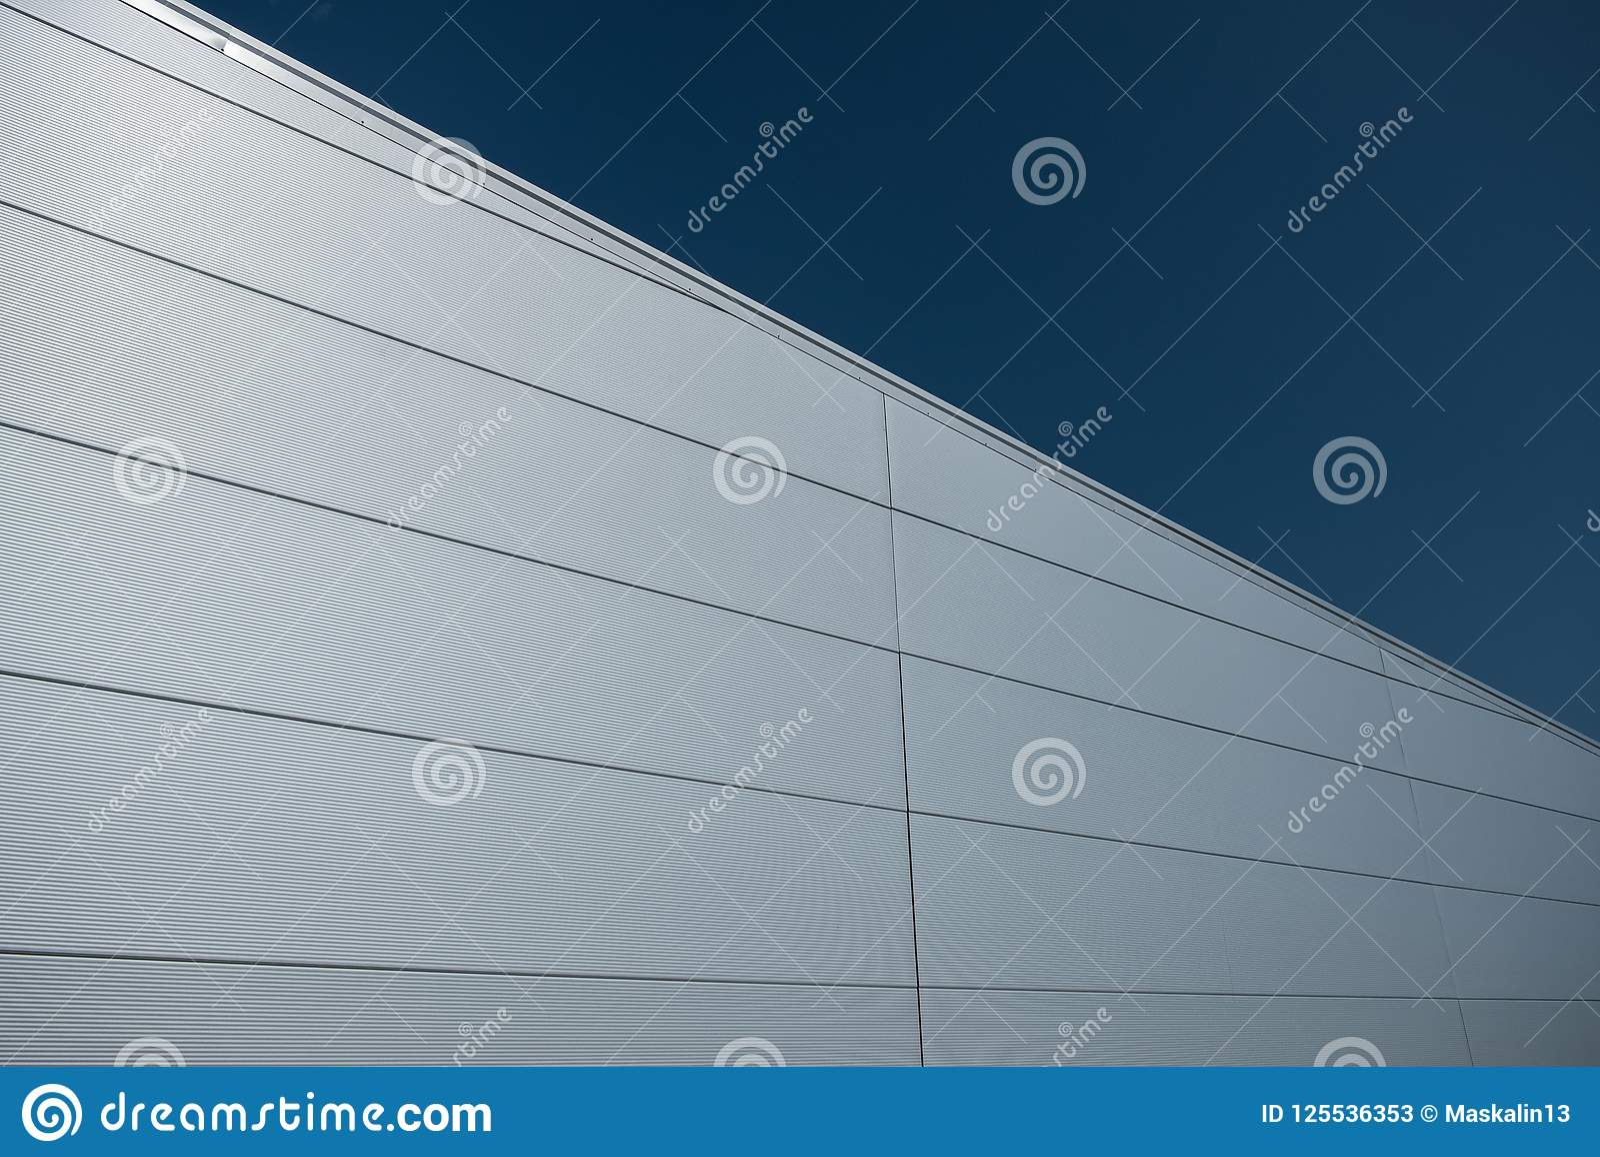 Steel Sandwich Panel Facade Stock Image - Image of modern